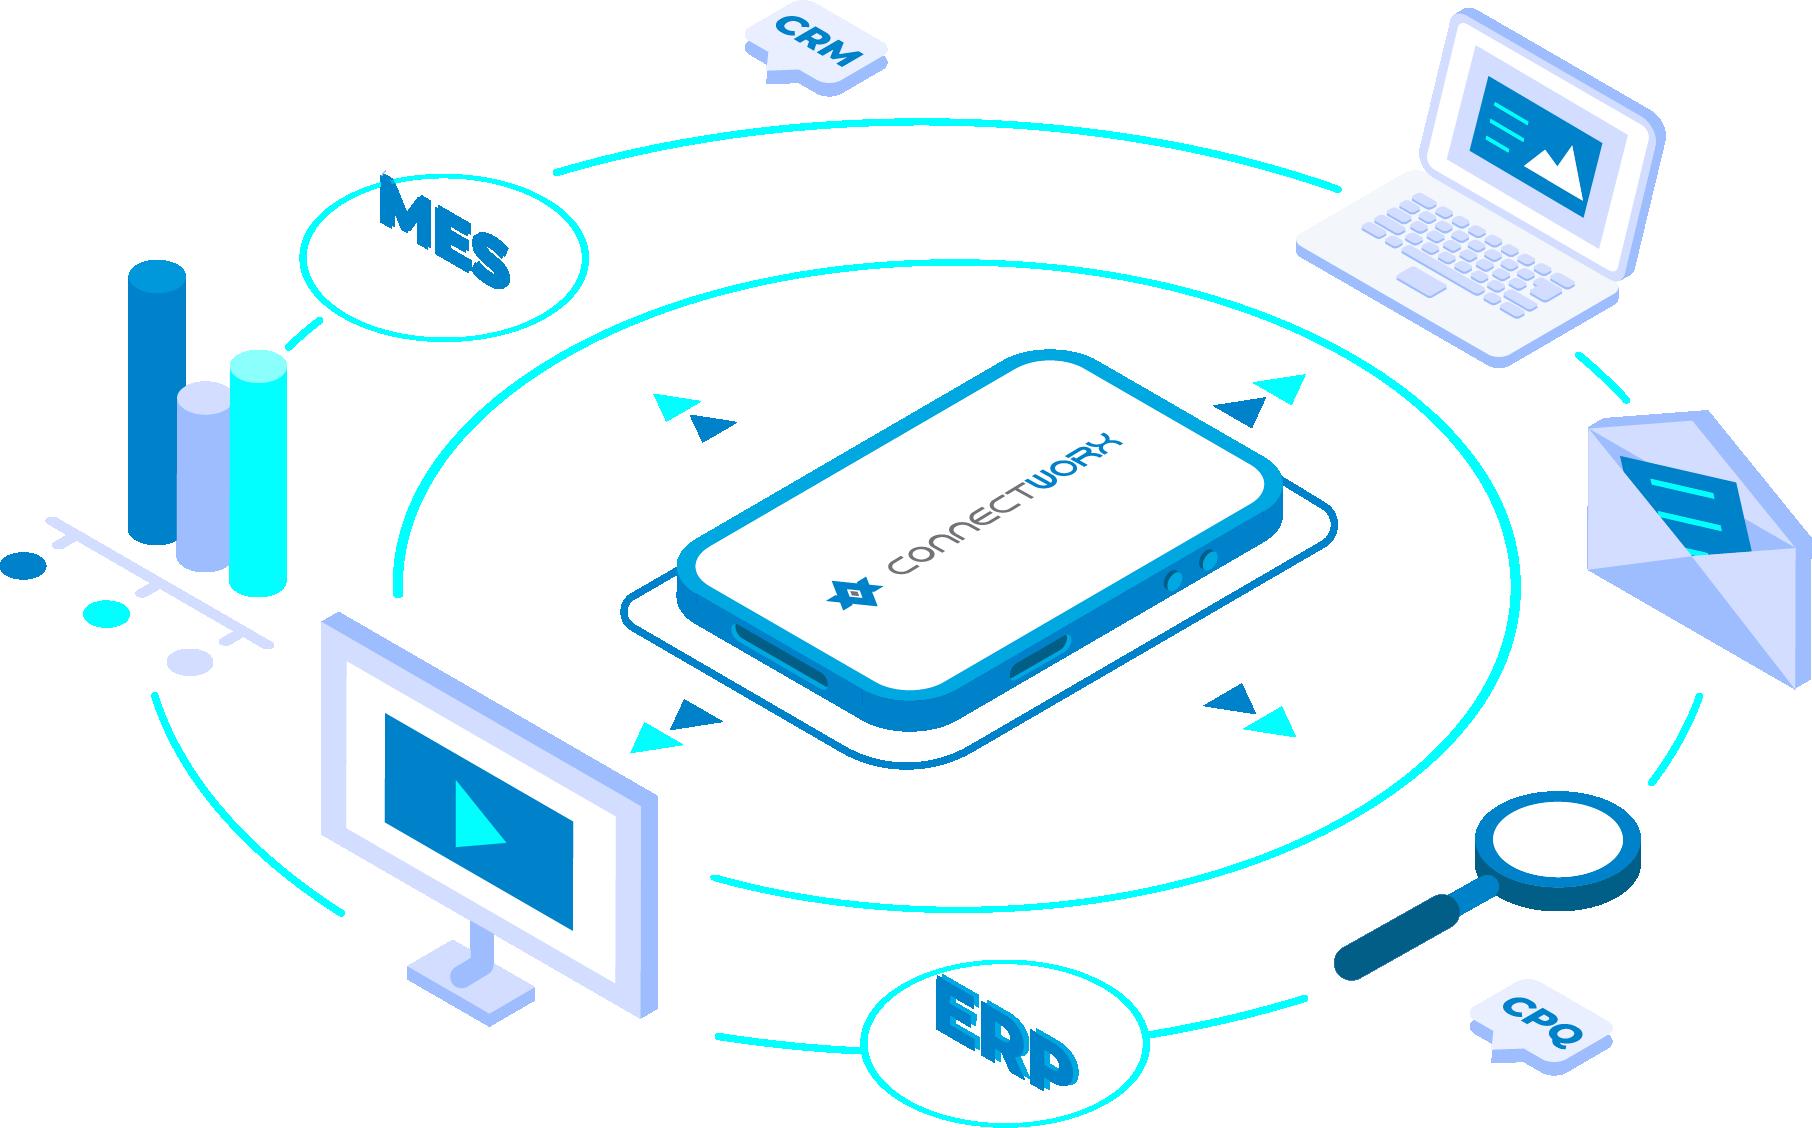 connectworx